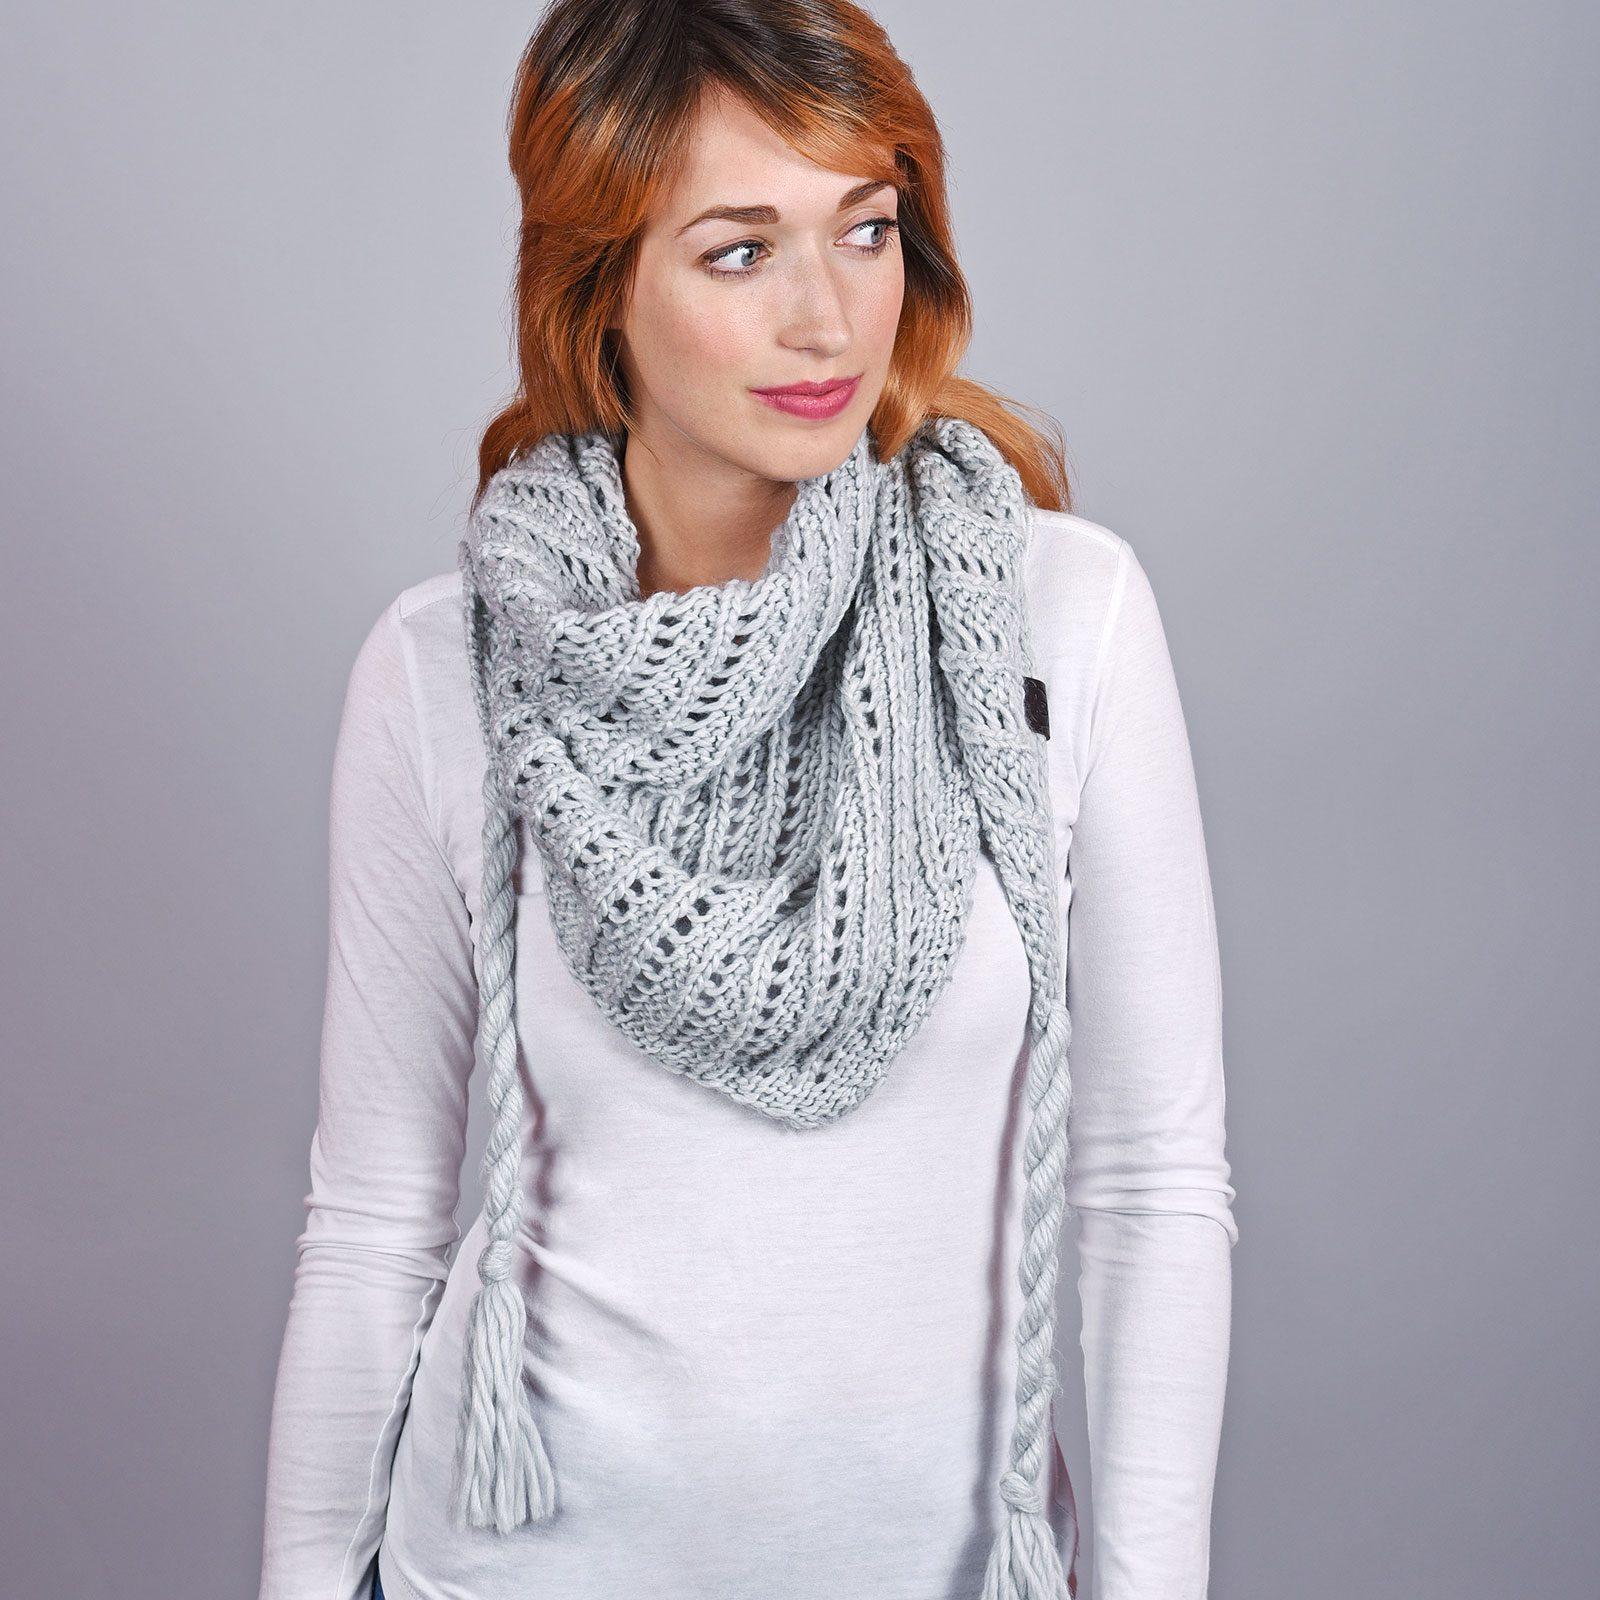 http://lookbook.allee-du-foulard.fr/wp-content/uploads/2018/12/AT-04552-VF16-1-echarpe-triangle-grise-1600x1600.jpg